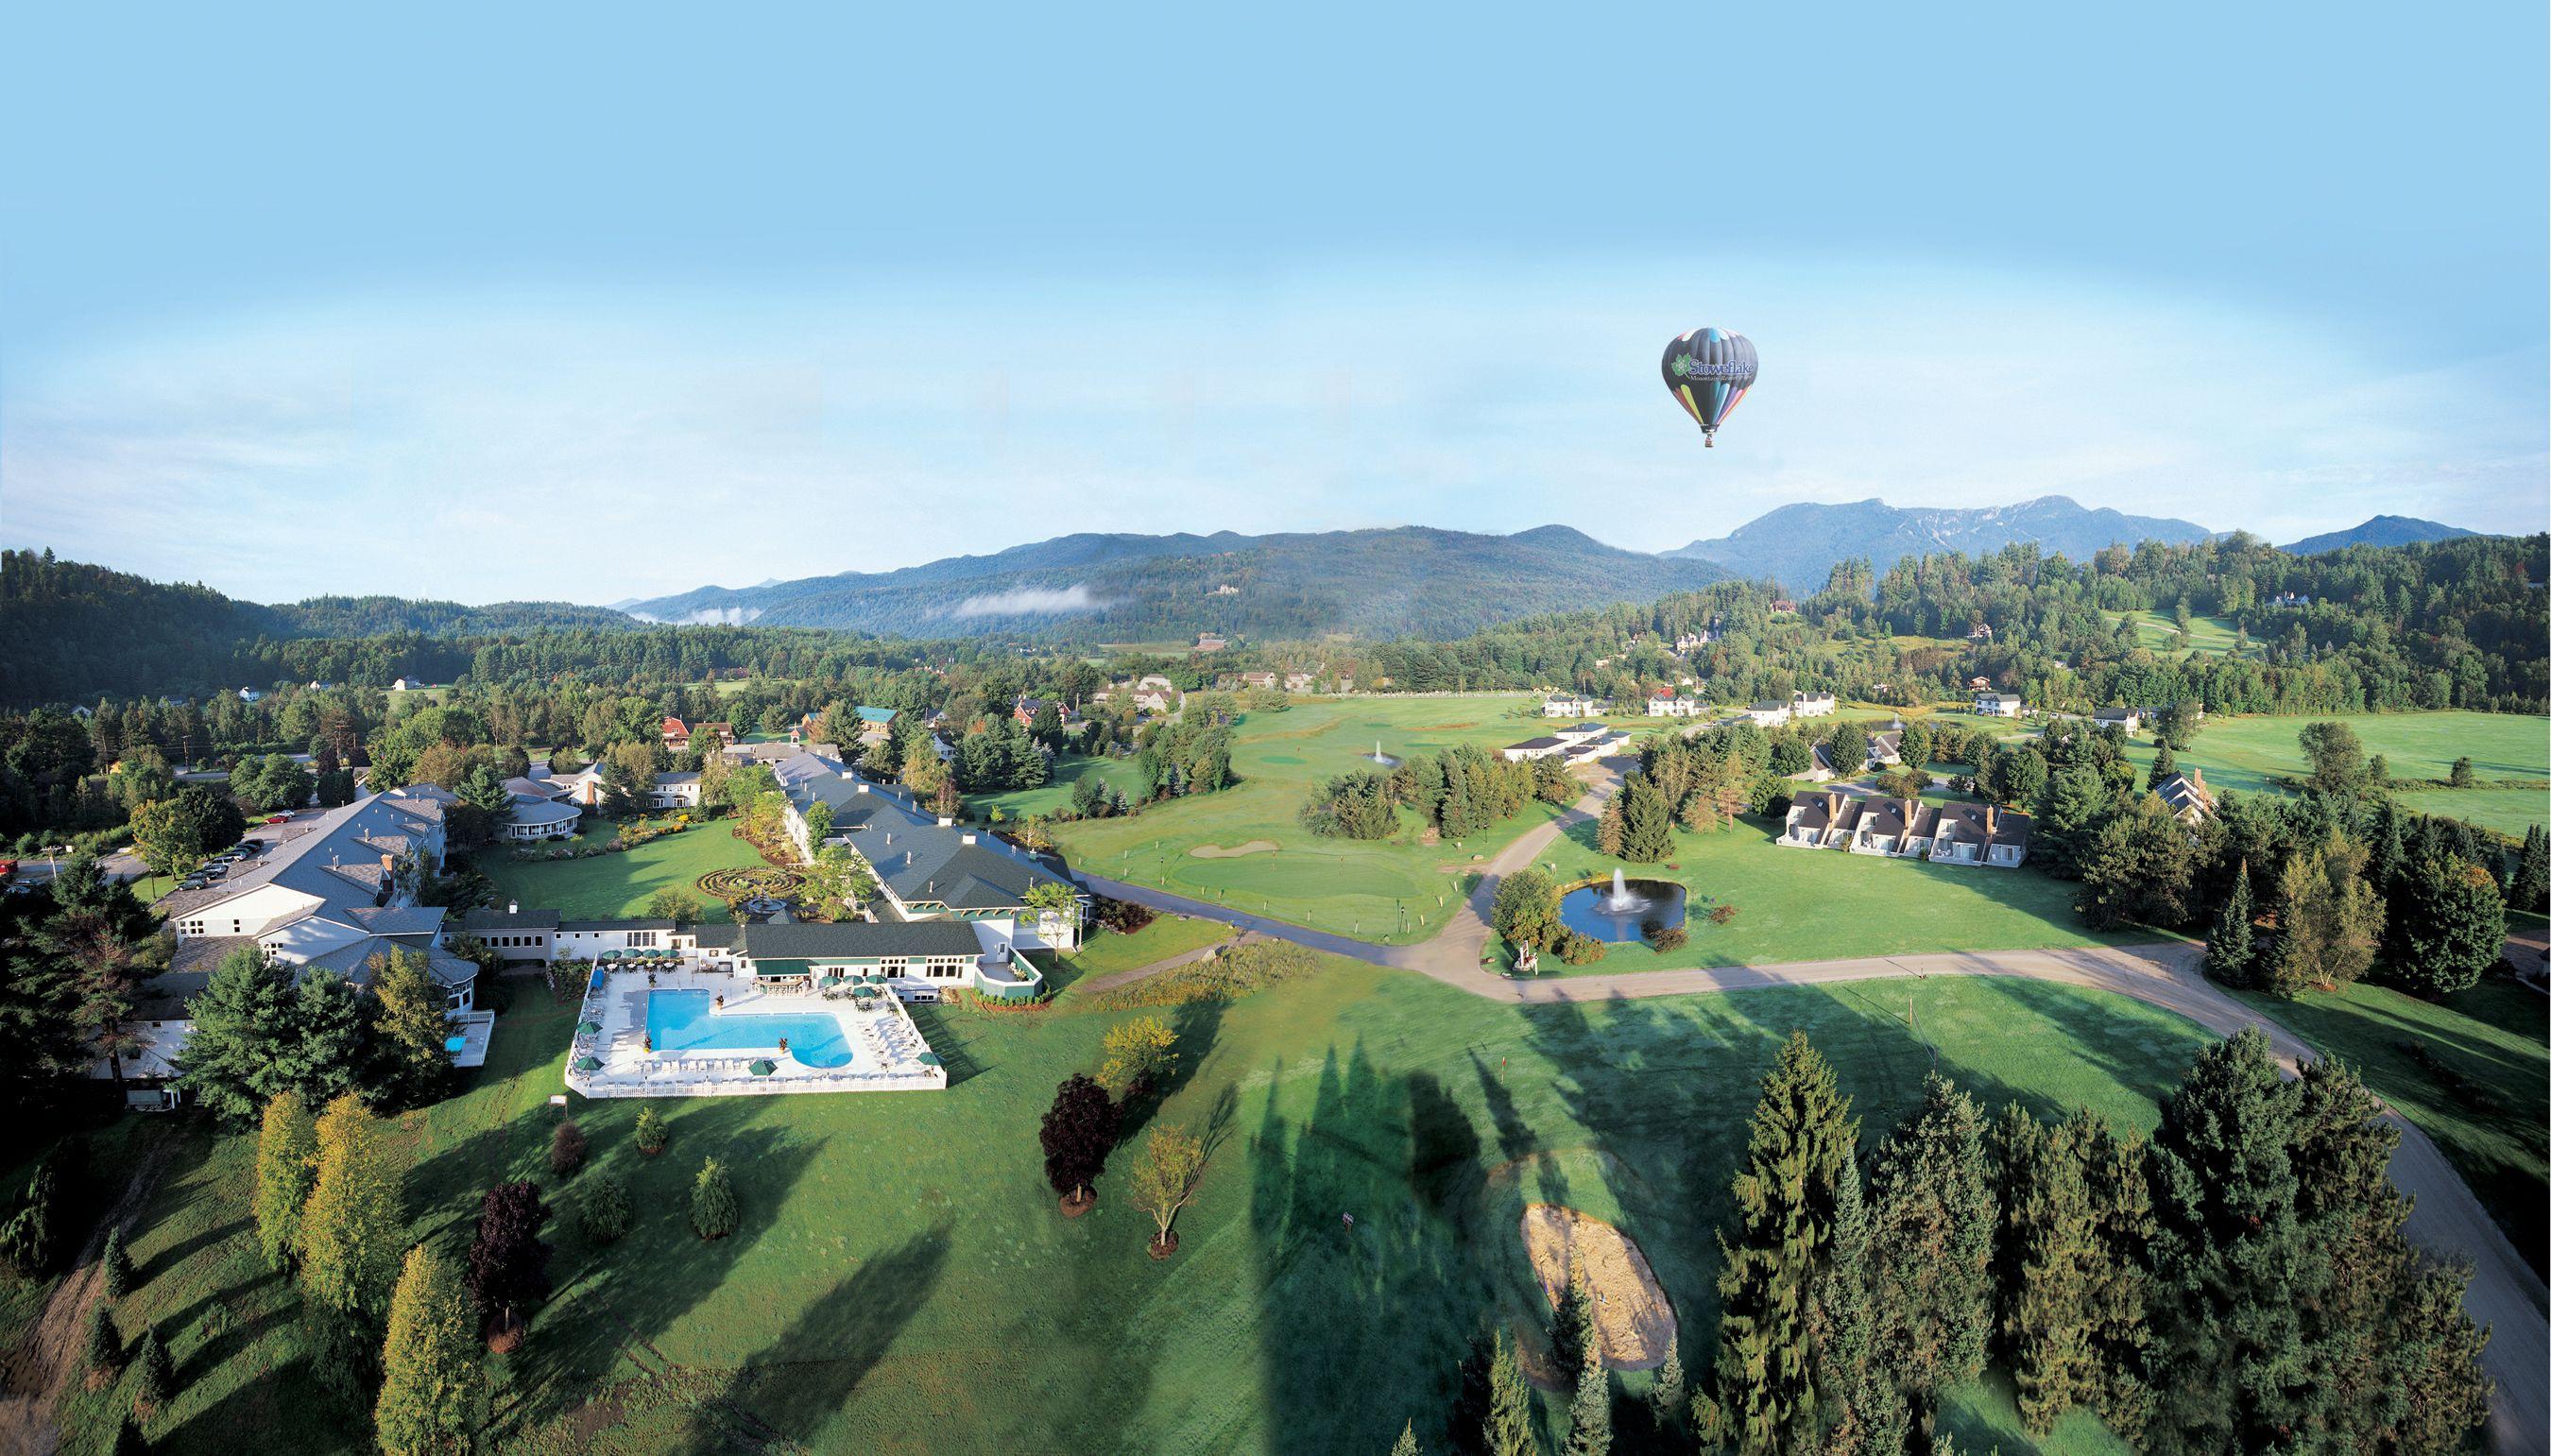 Courtesy of Stoweflake Mountain Resort & Spa / Expedia